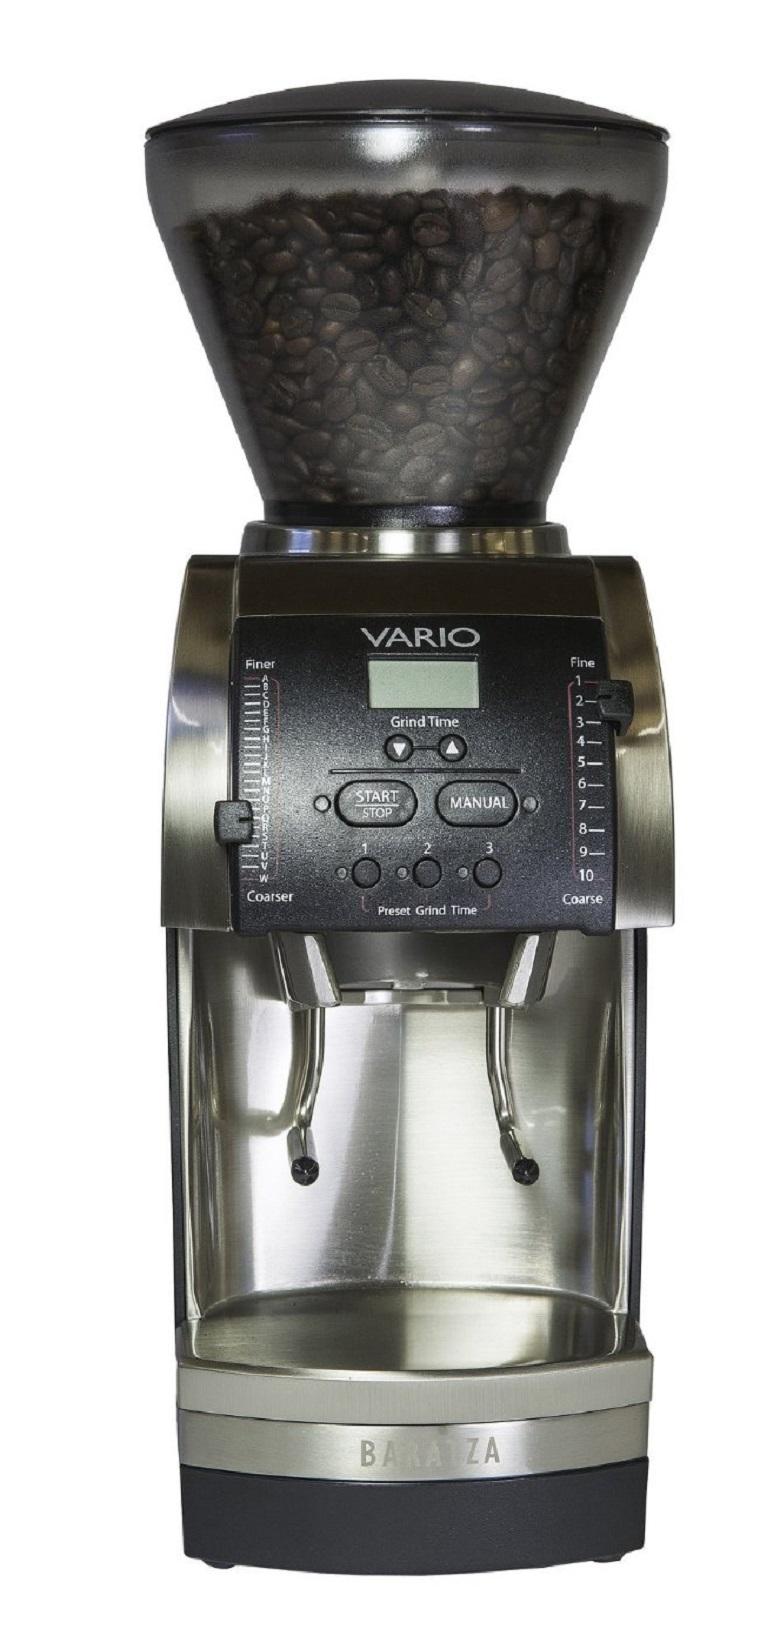 Baratza Vario 886 - Flat Ceramic Coffee Grinder, coffee grinder